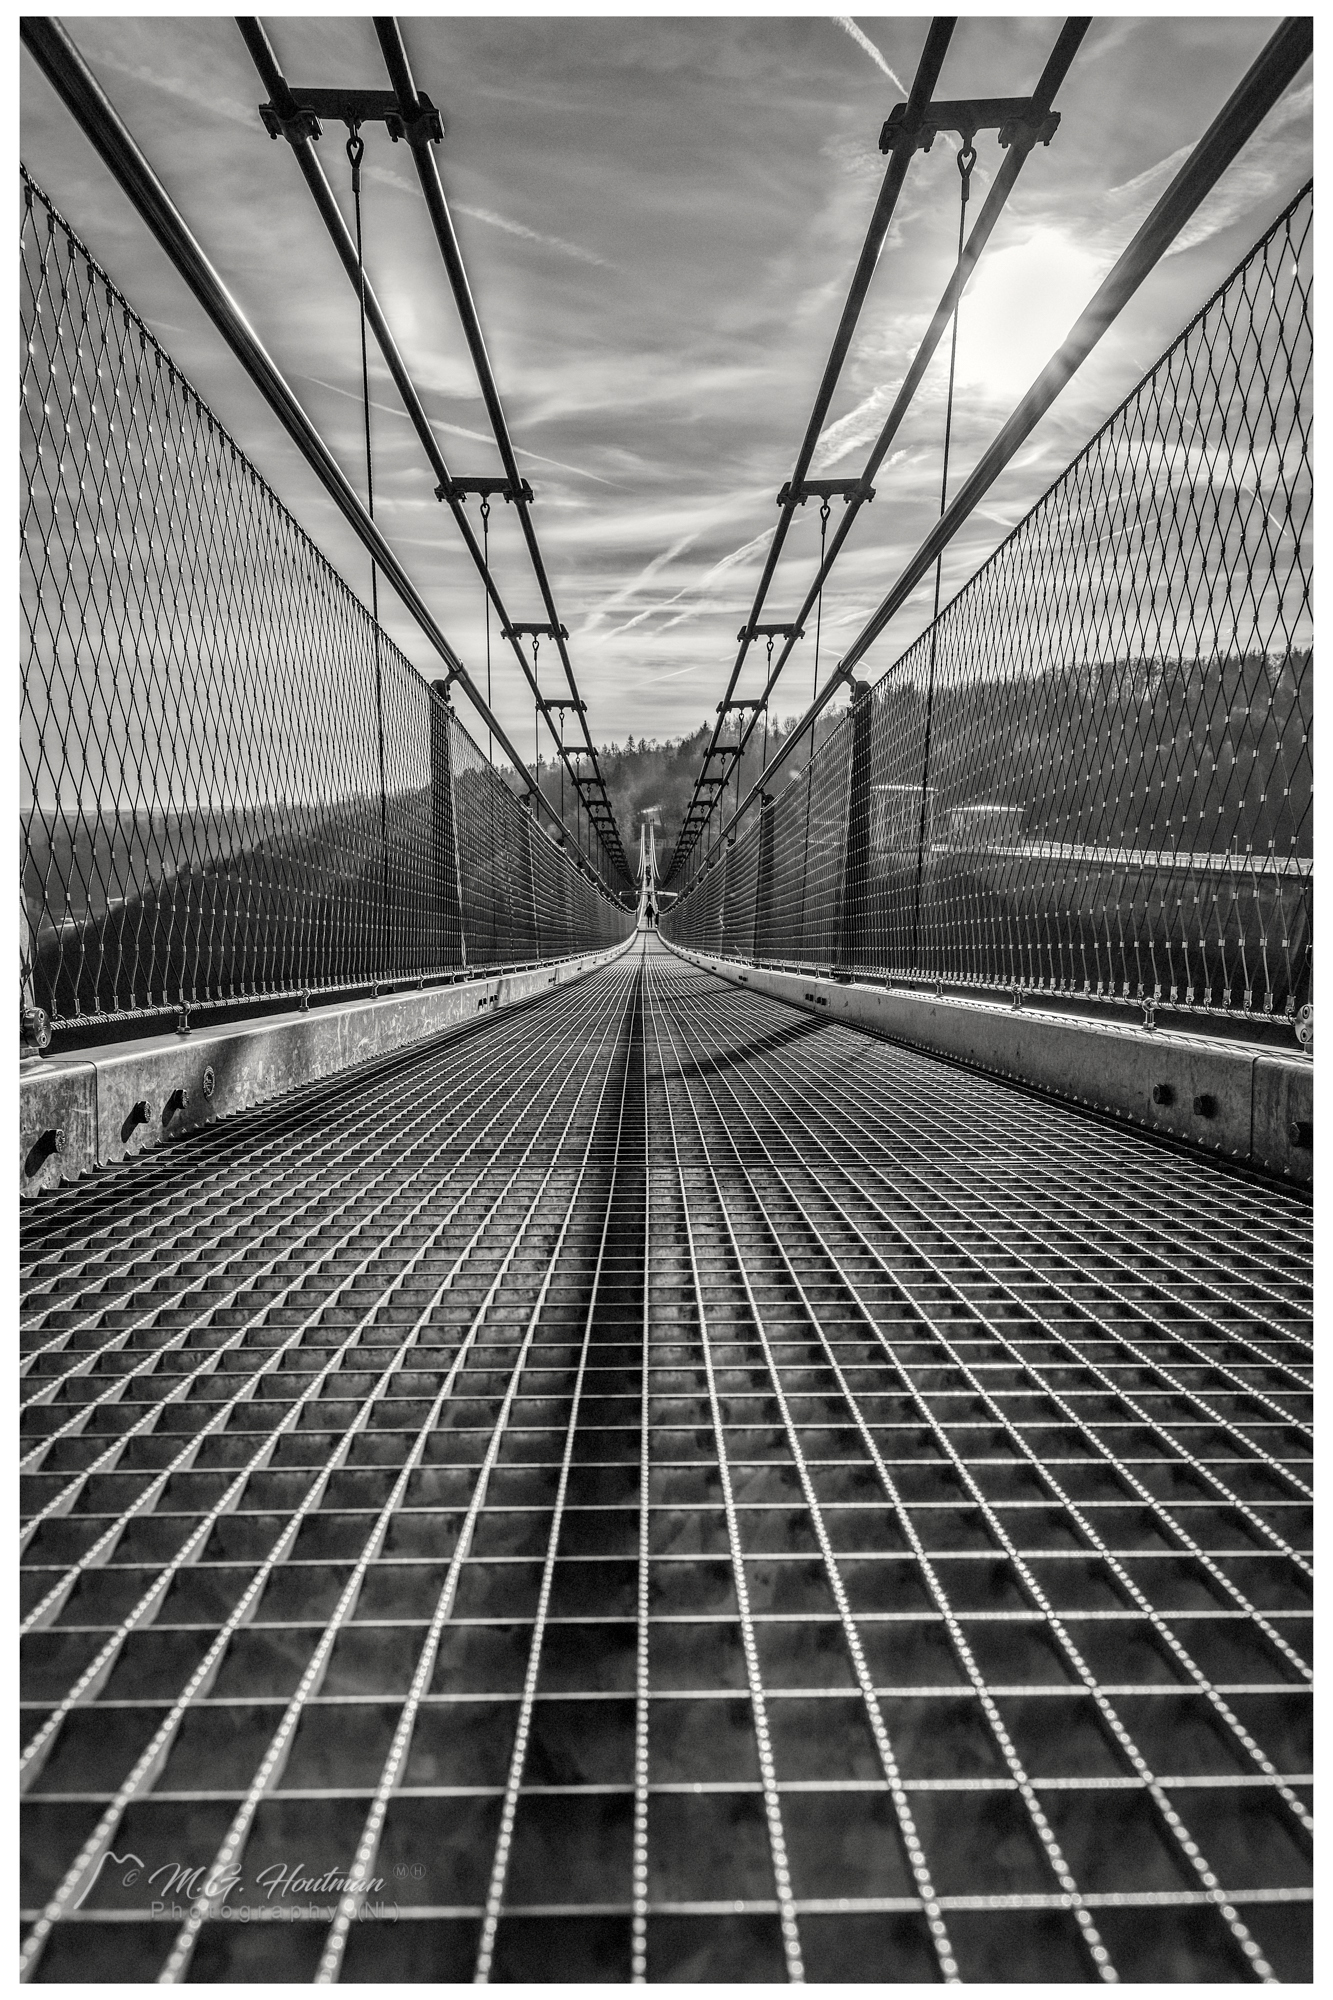 Seilhängebrücke Rappbodetalsperre - Ebingerode